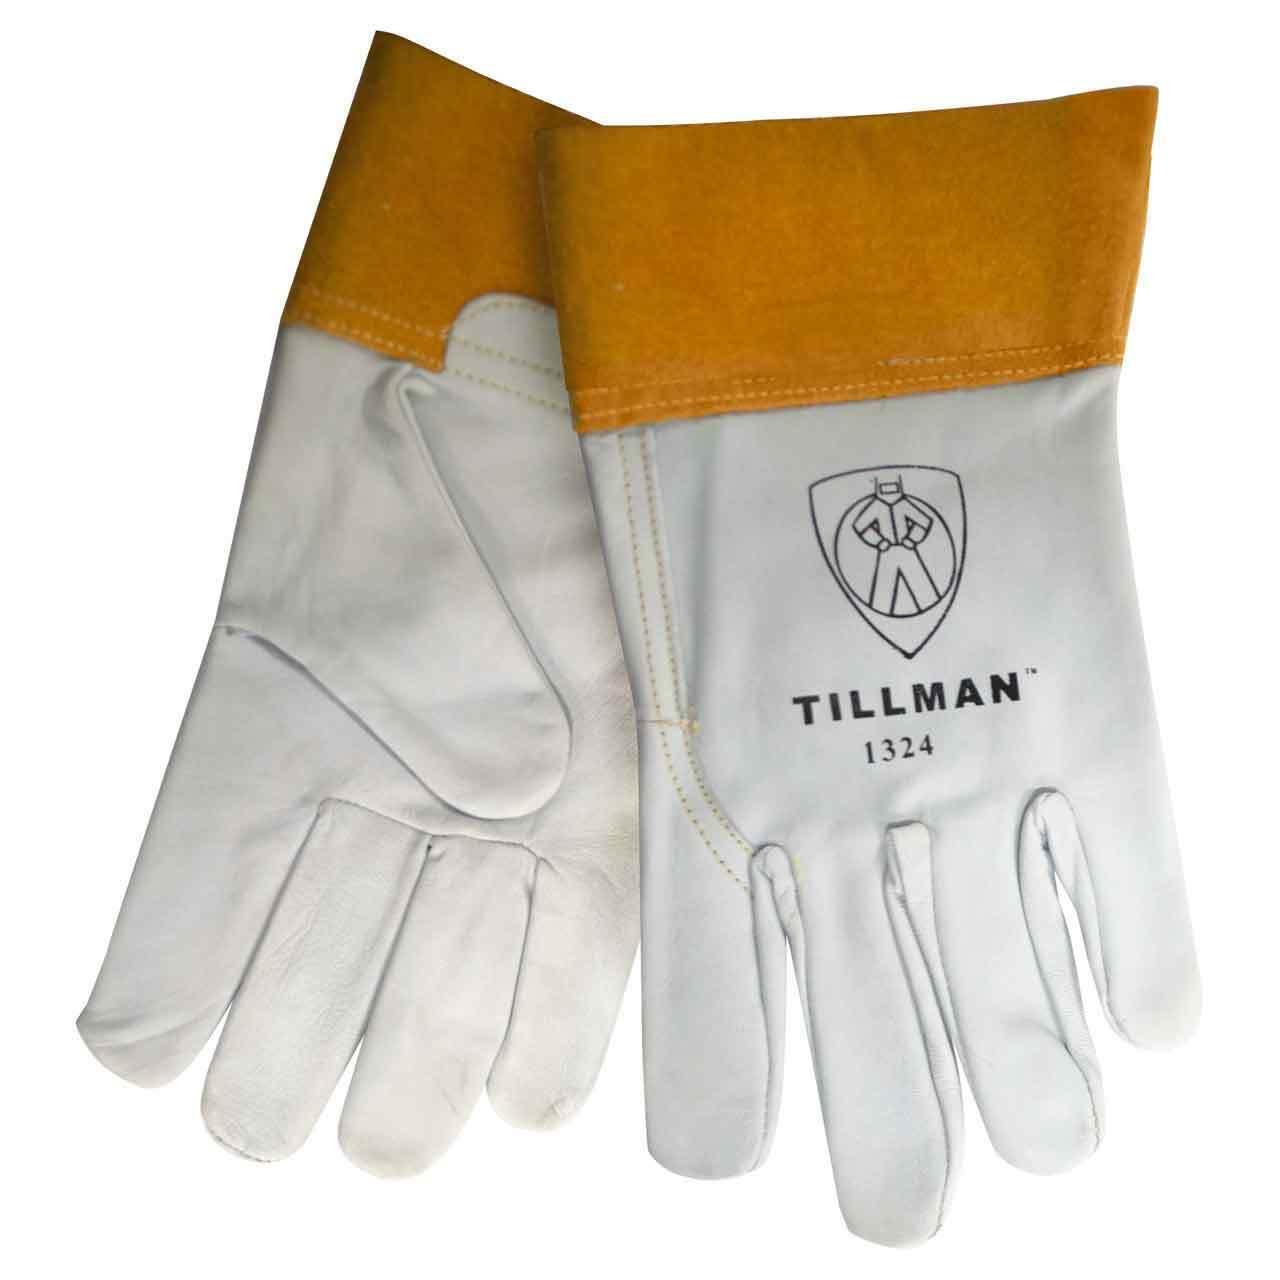 Tillman 1324 2″ Cuff Welding Kidskin Goatskin Leather TIG Gloves Sizes- SM-XL Business & Industrial